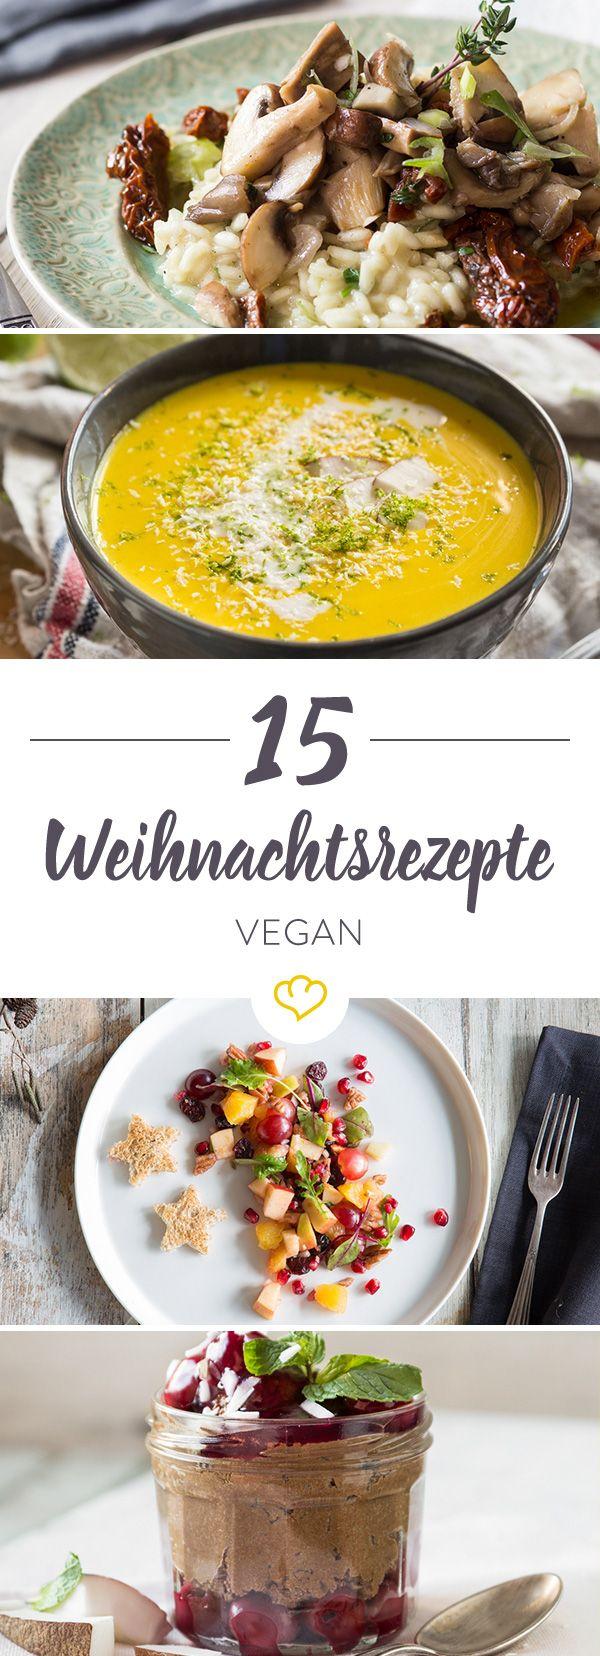 Photo of 15 vegan recipes for your perfect Christmas menu